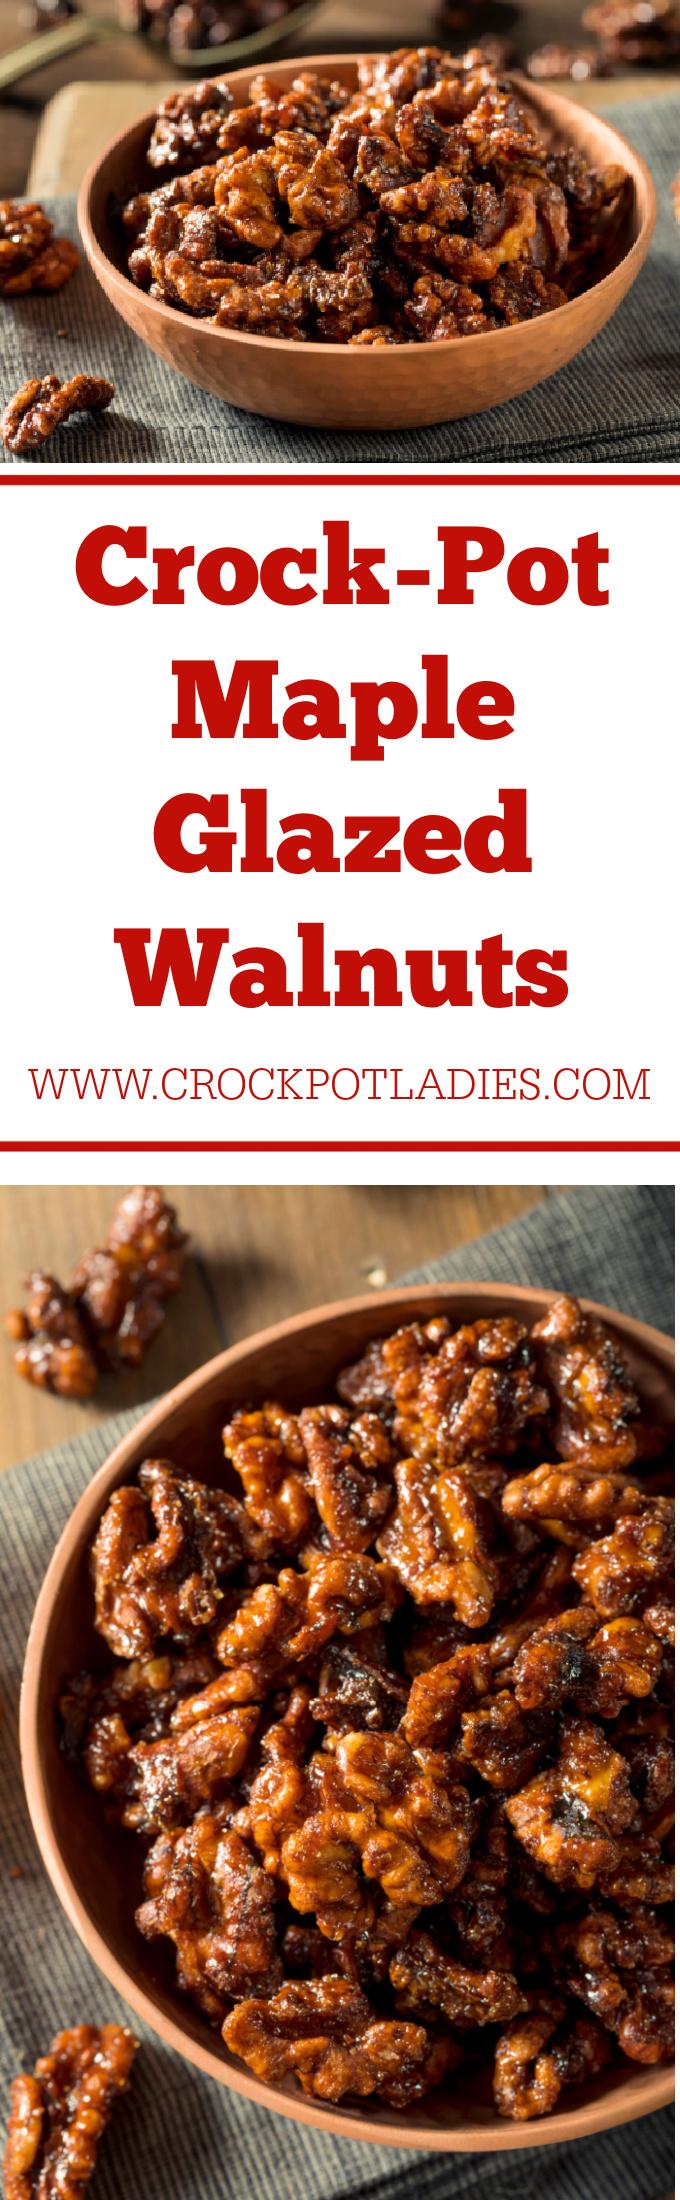 Crock-Pot Maple Glazed Walnuts